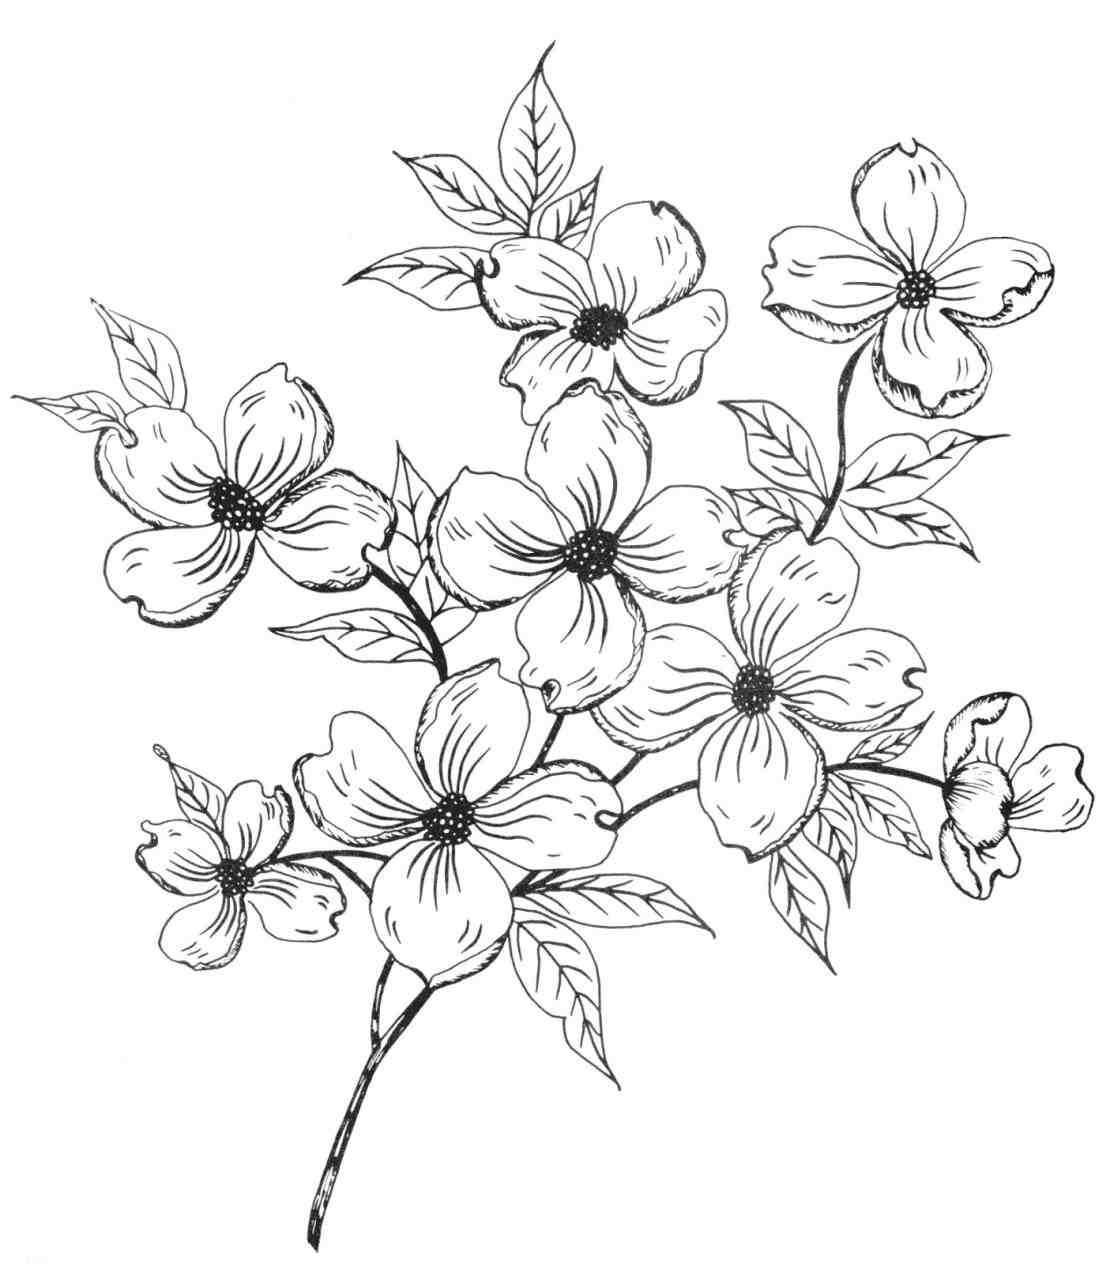 1106x1264 Lady Evelyneus Sketches U Art I Easy Flower Line Drawing Tumblr S